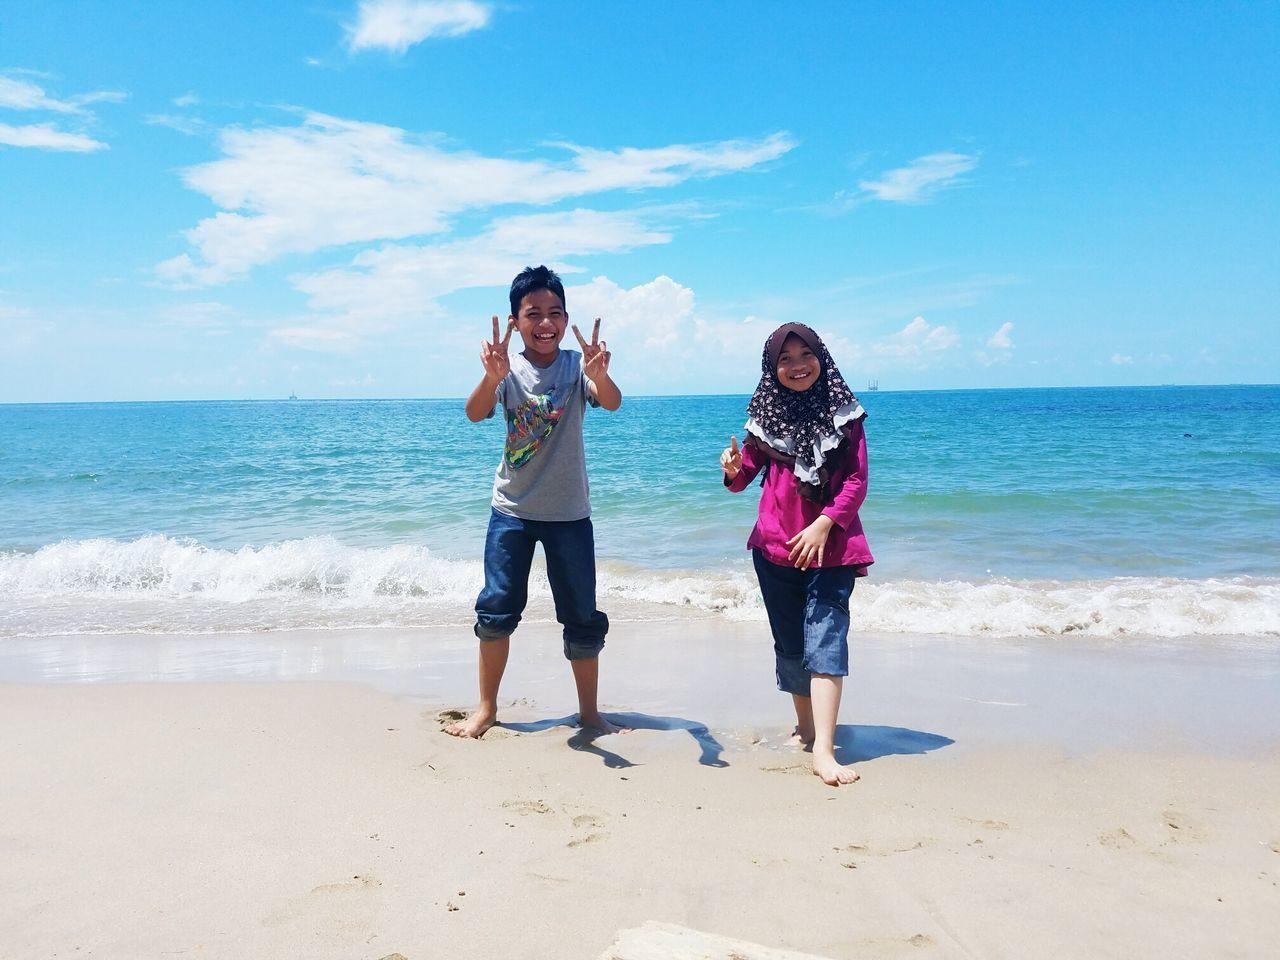 Portrait Of Happy Siblings Gesturing While Standing At Beach Against Sky